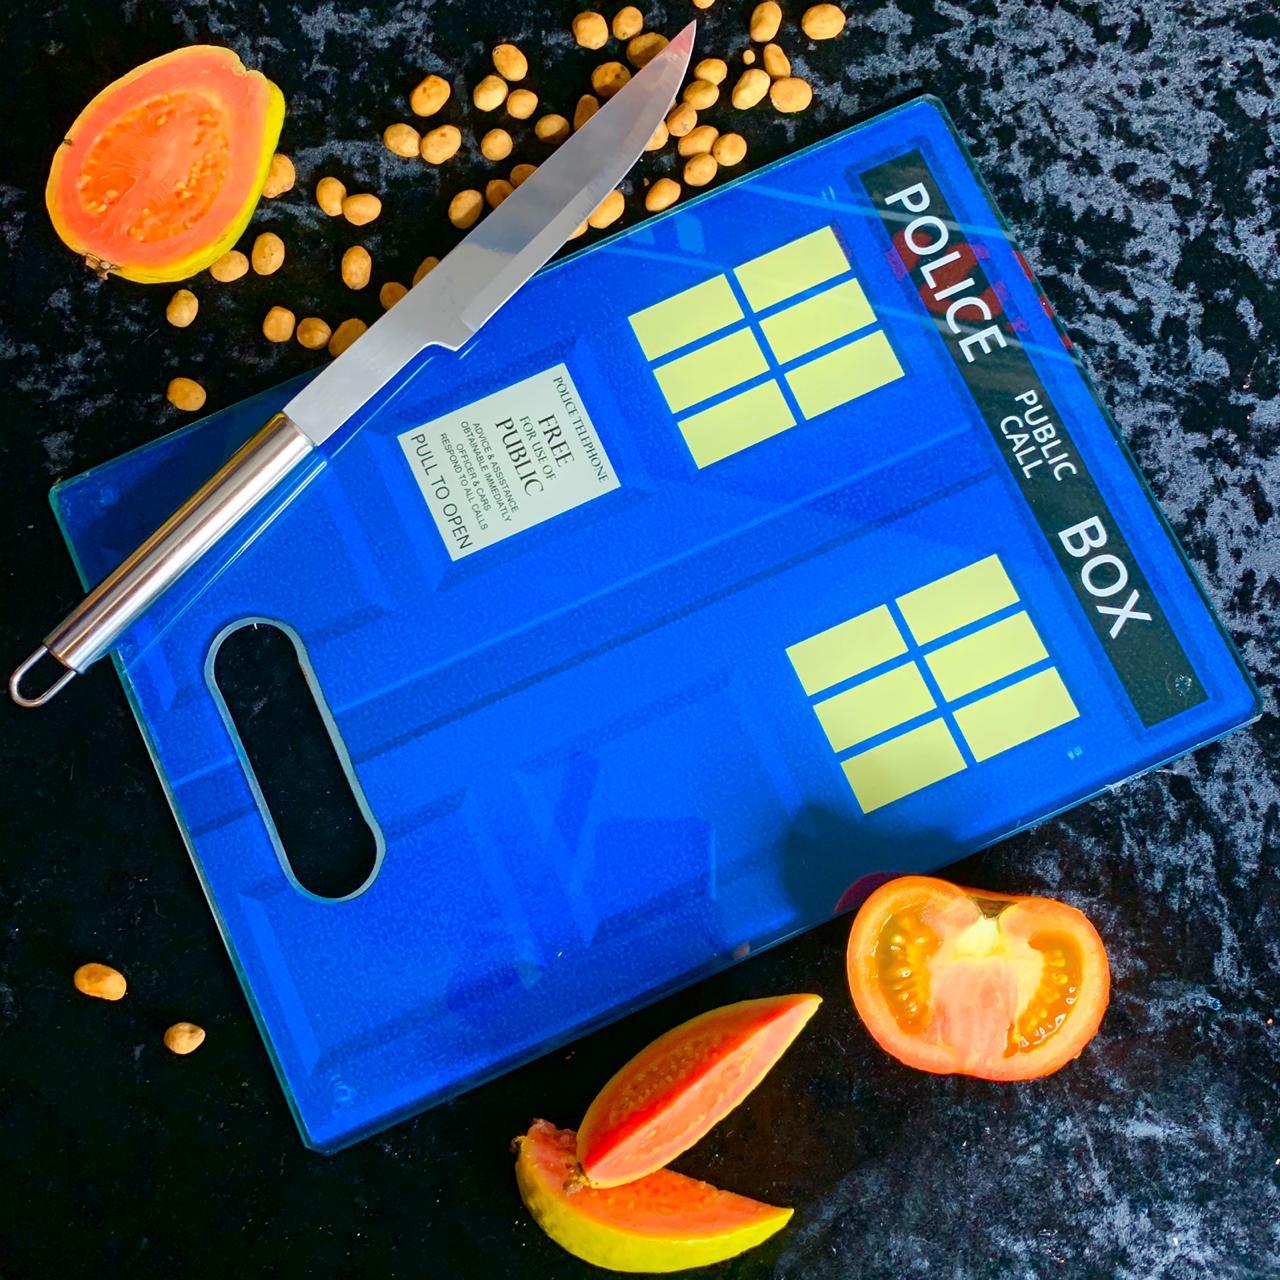 Tábua de Carne de Vidro TARDIS: Doctor Who (35x25cm)